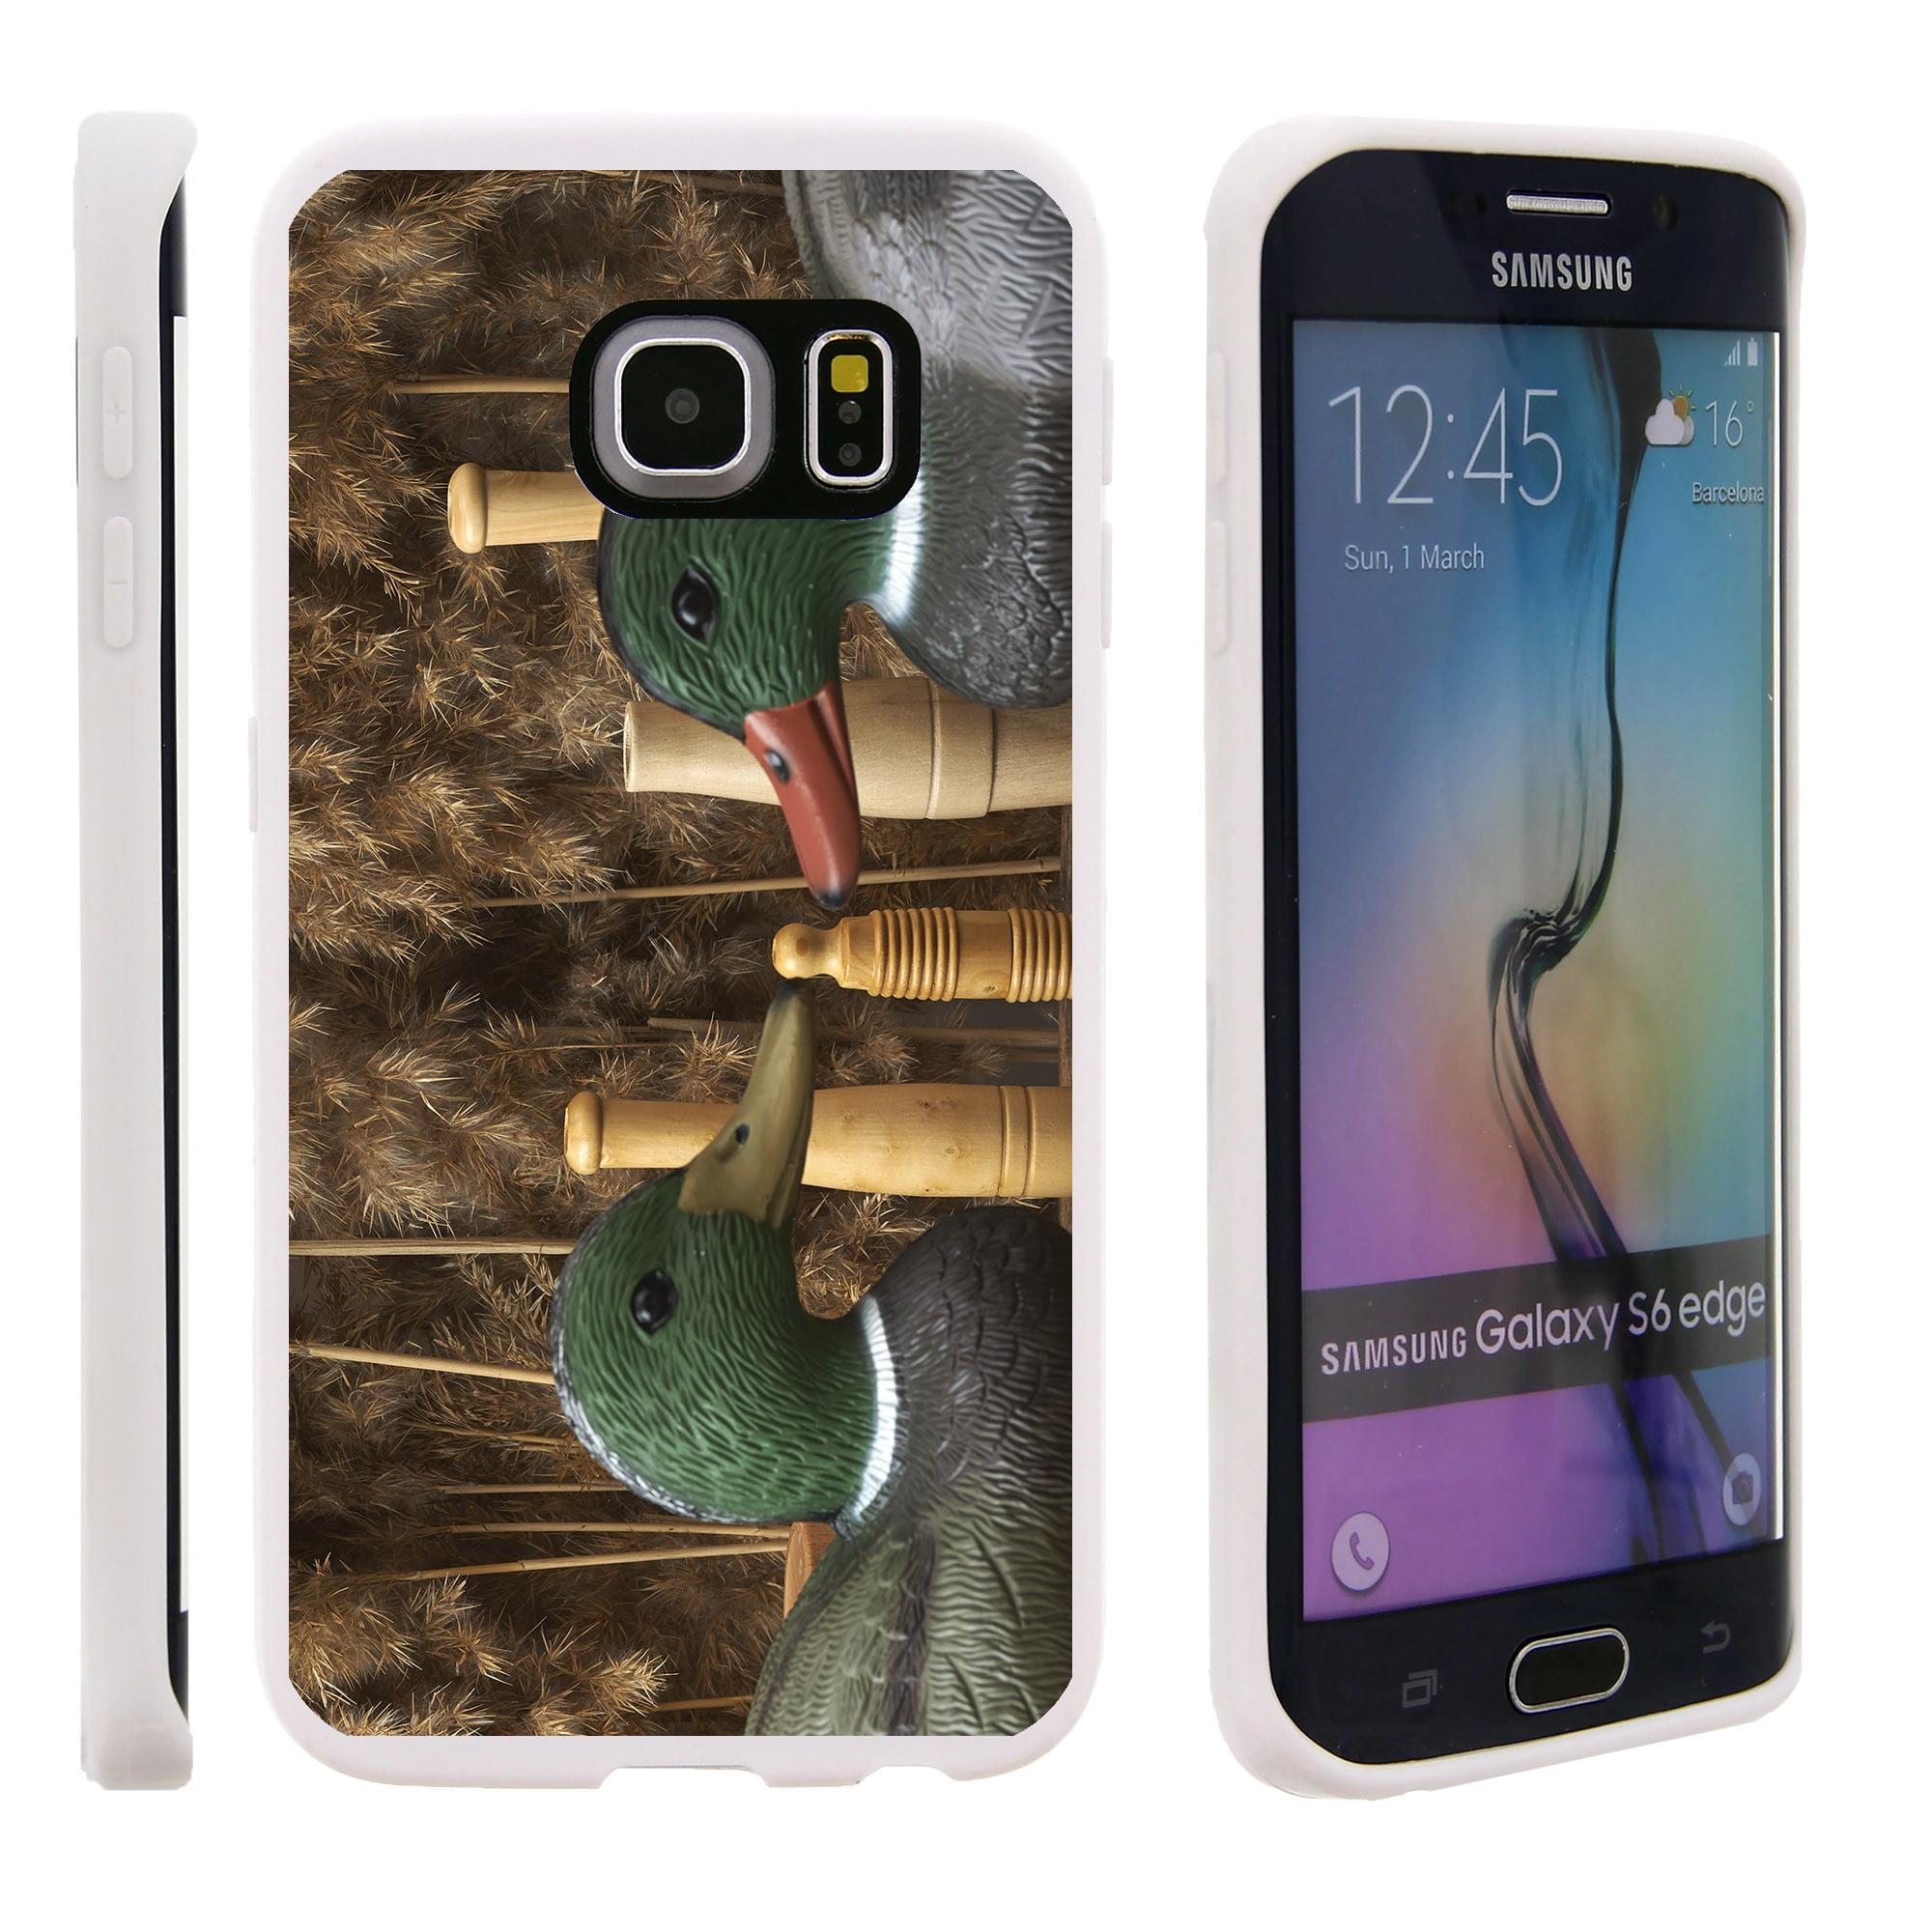 Samsung Galaxy S6 Edge G925, Flexible Case [FLEX FORCE] Slim Durable TPU Sleek Bumper with Unique Designs - Two Wood Ducks